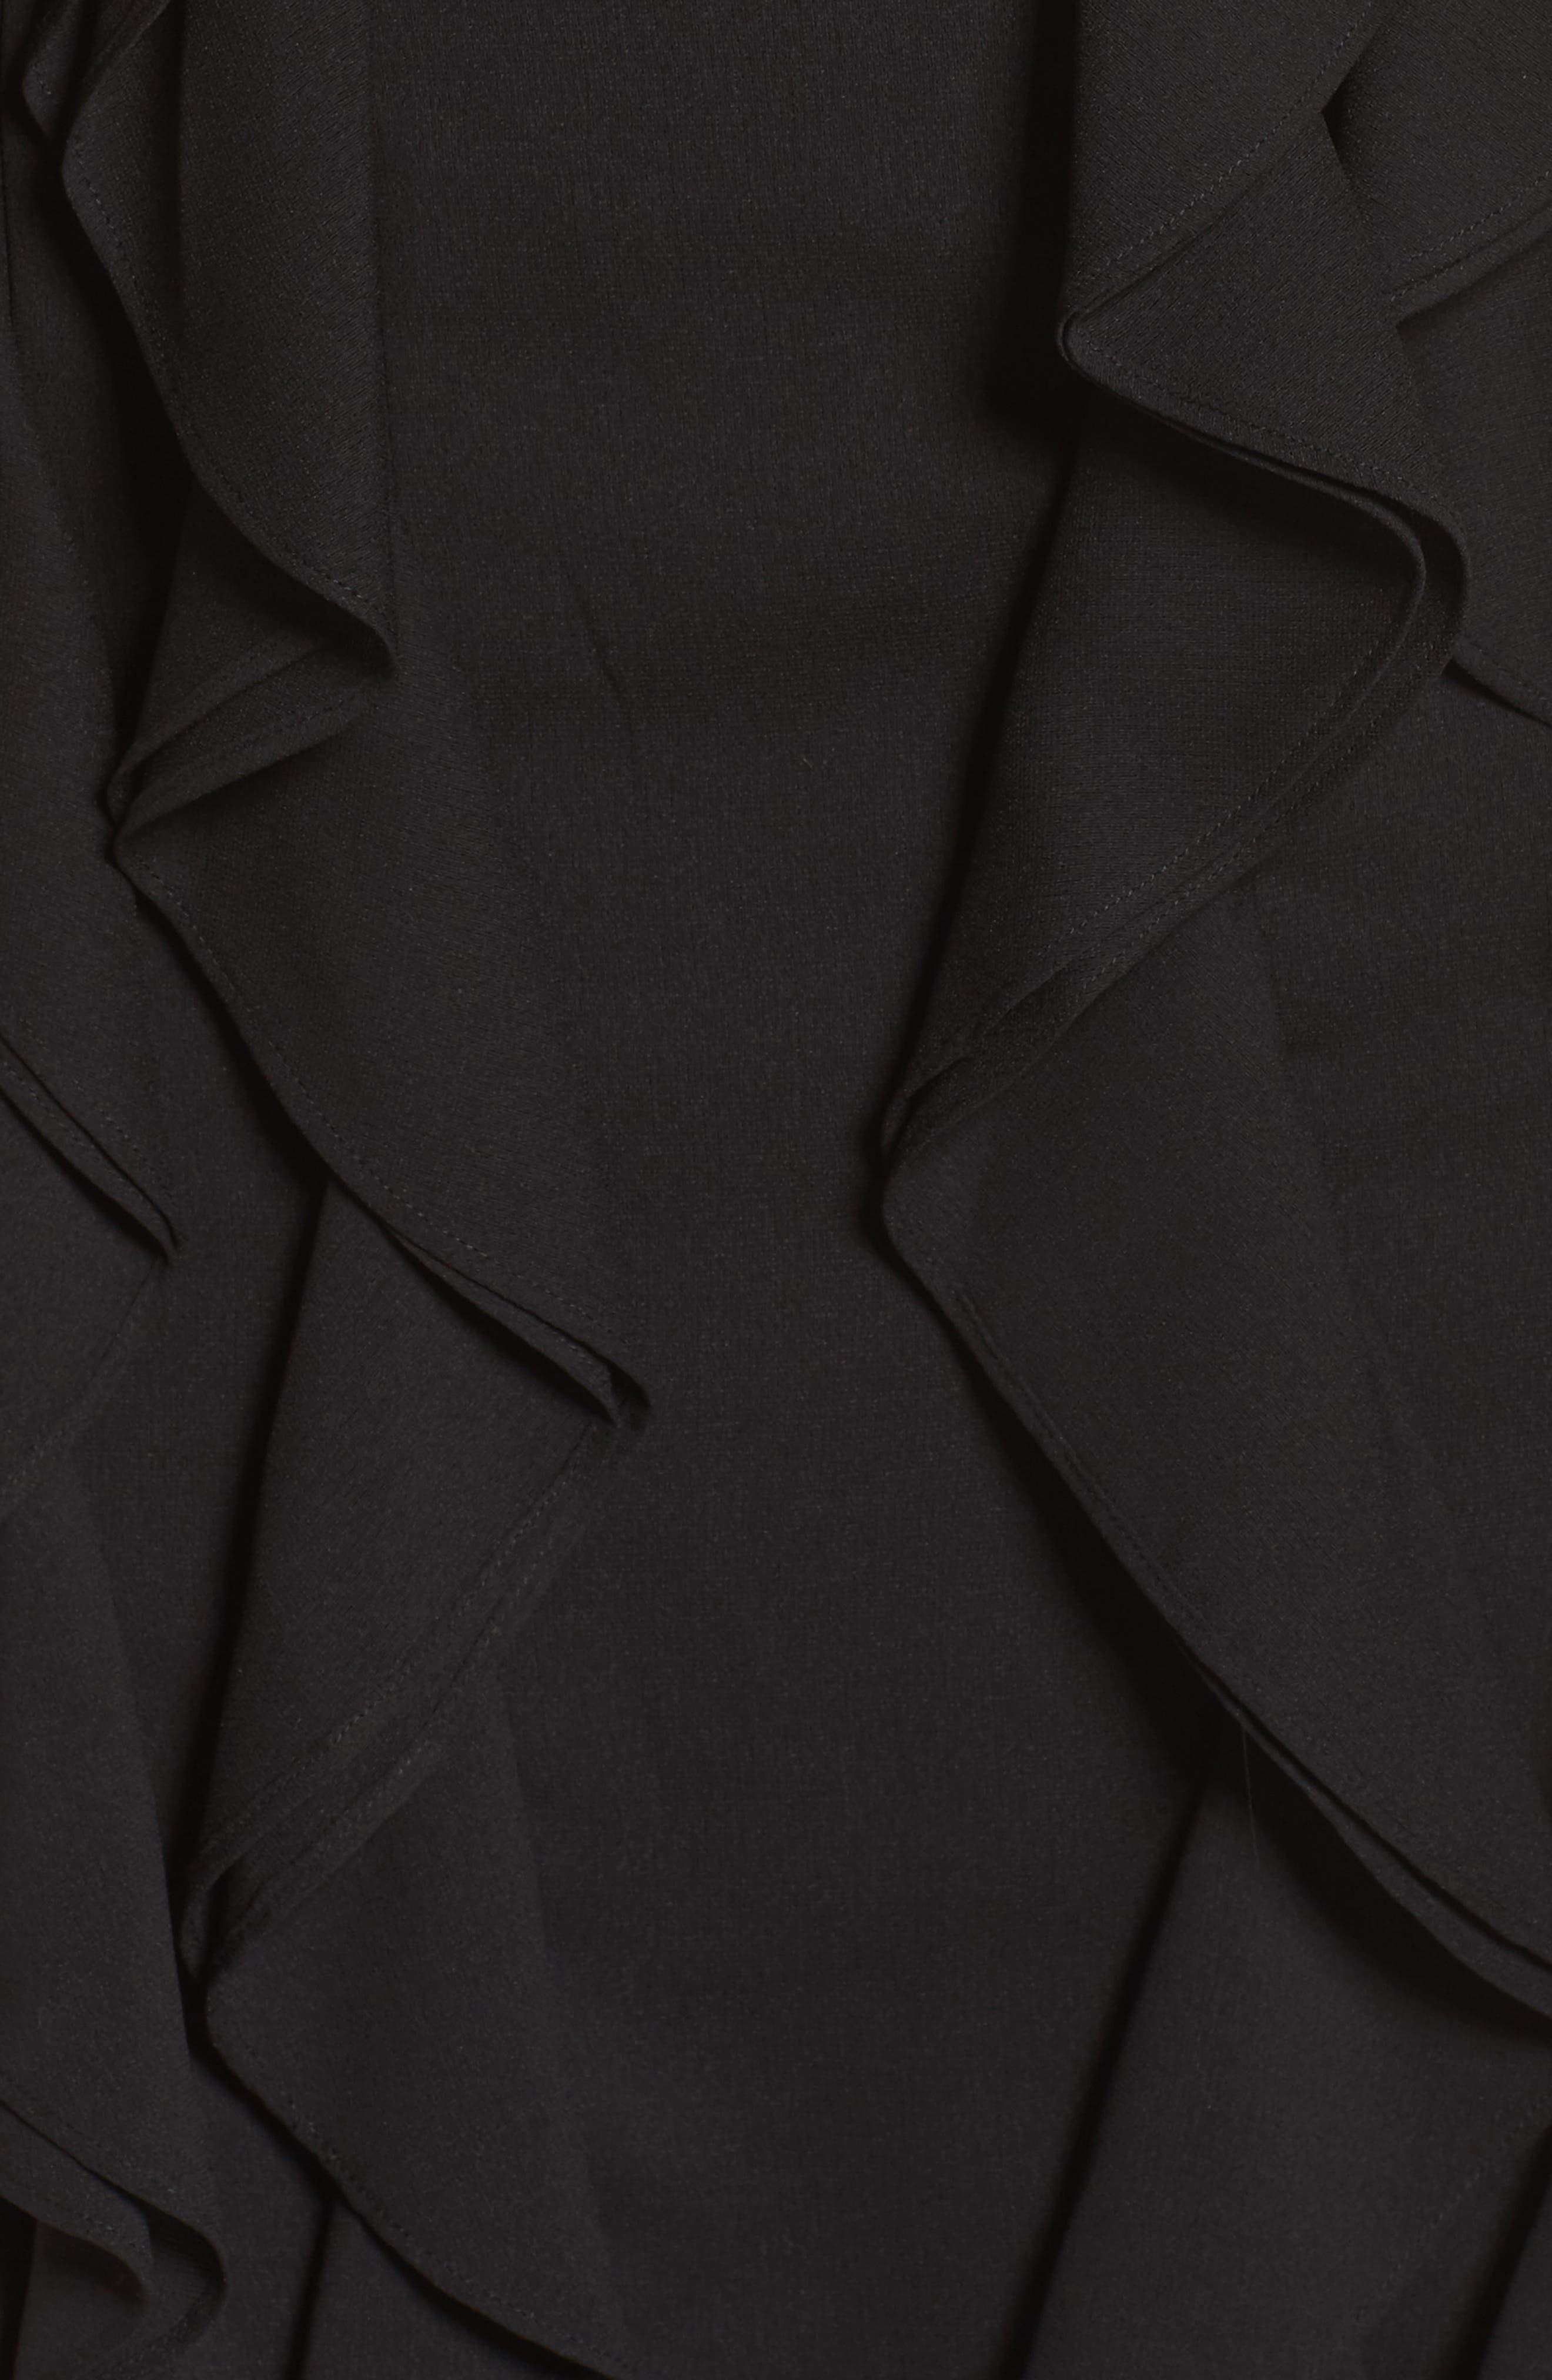 Dream State Off the Shoulder Sheath Dress,                             Alternate thumbnail 5, color,                             001